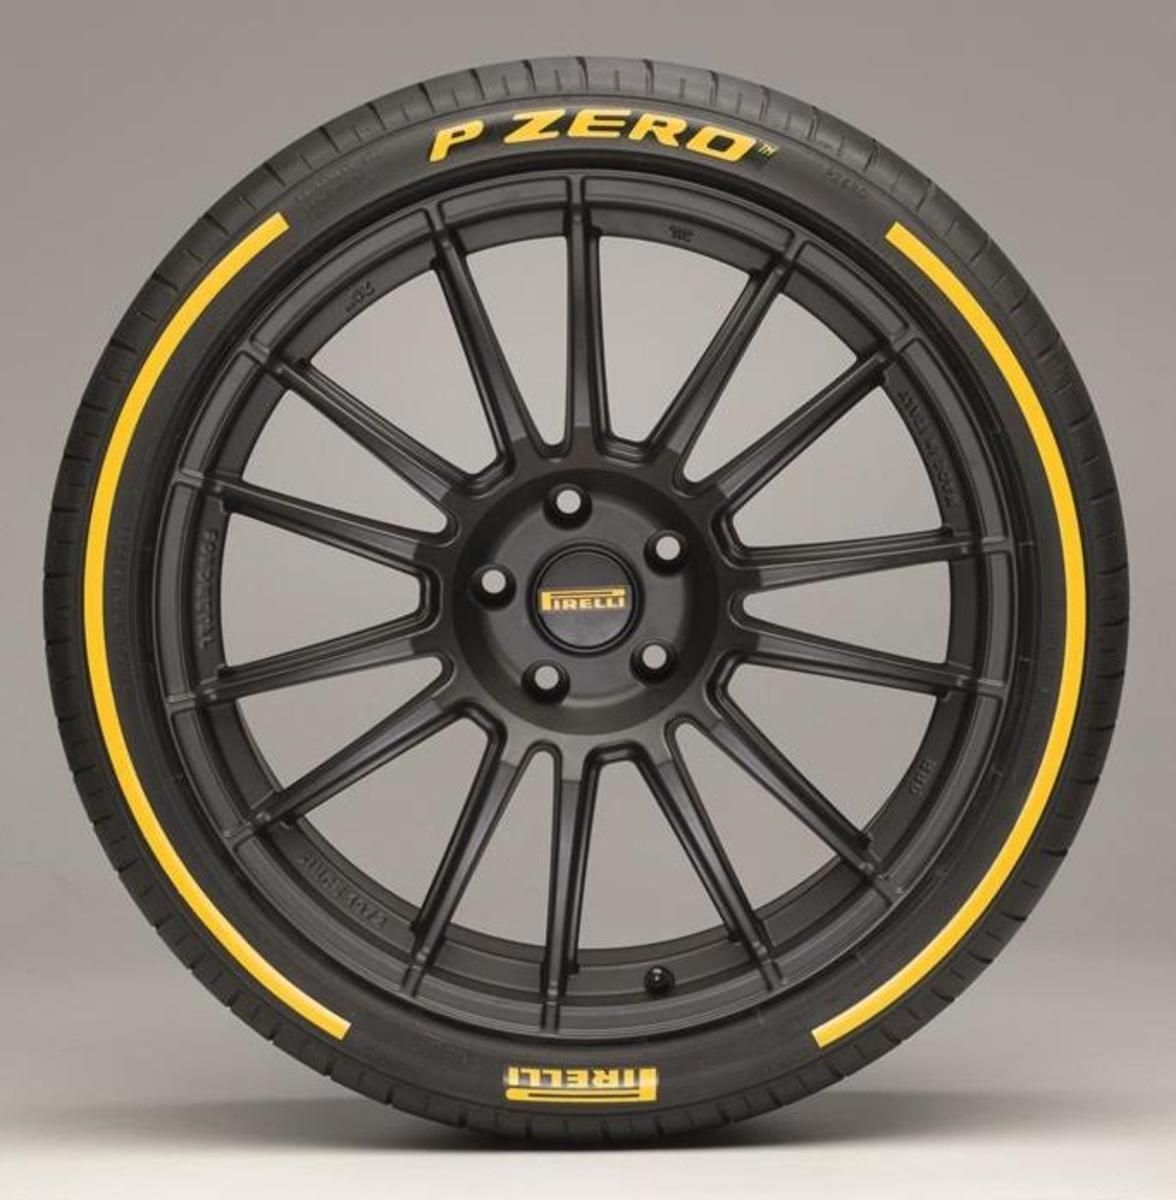 Pirelli Releases Their P Zero In A Variety Of Colors Pirelli Tires Pirelli Custom Wheels Cars [ 1200 x 1176 Pixel ]